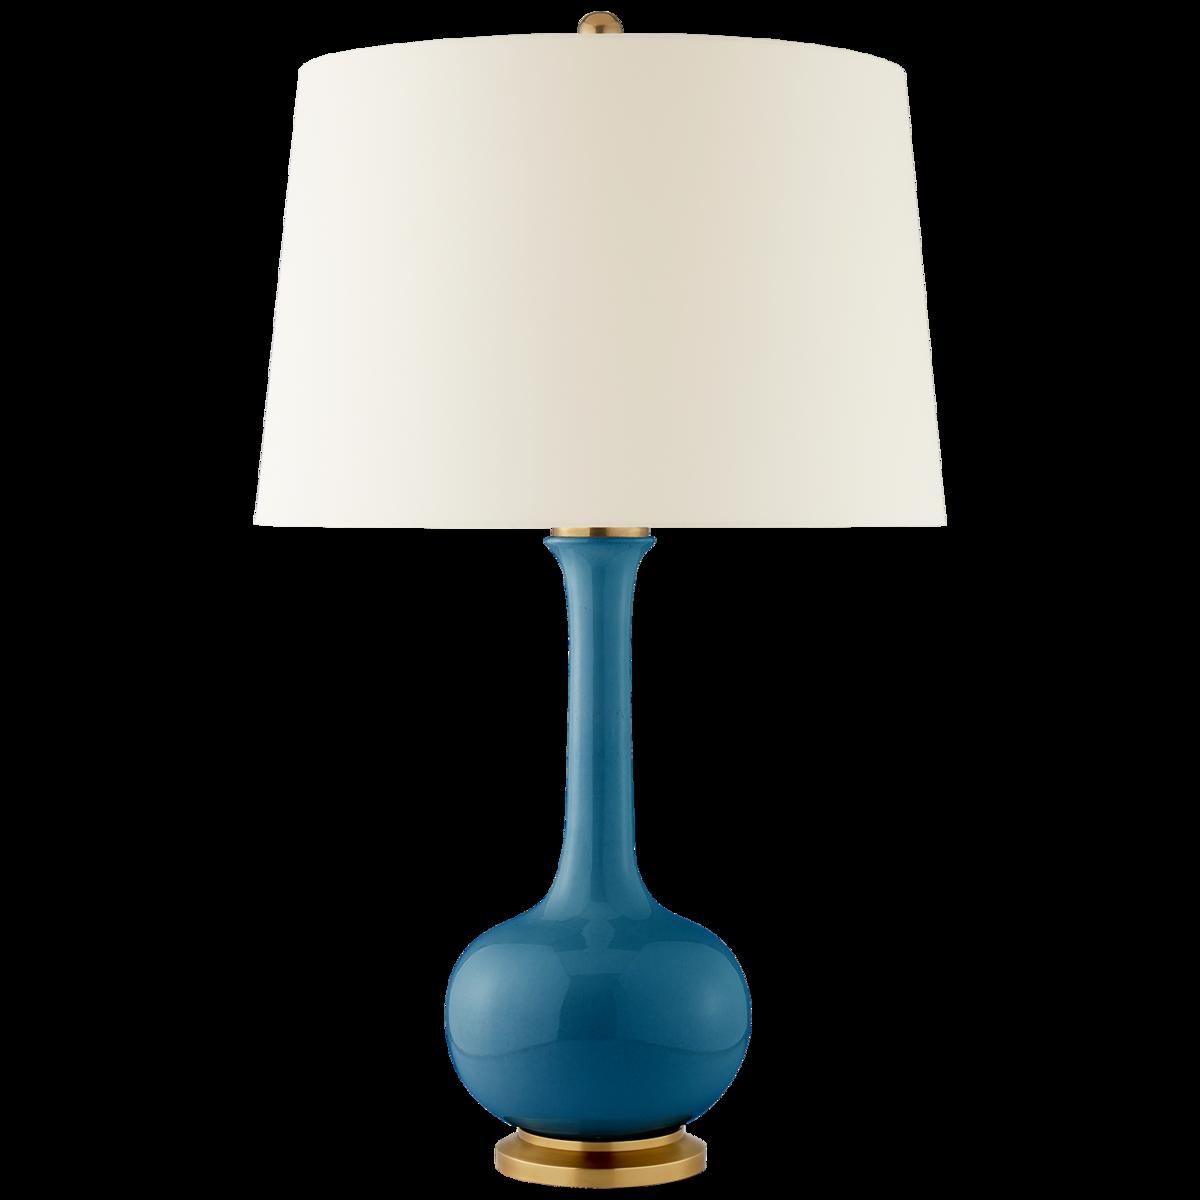 Coy Medium Table Lamp